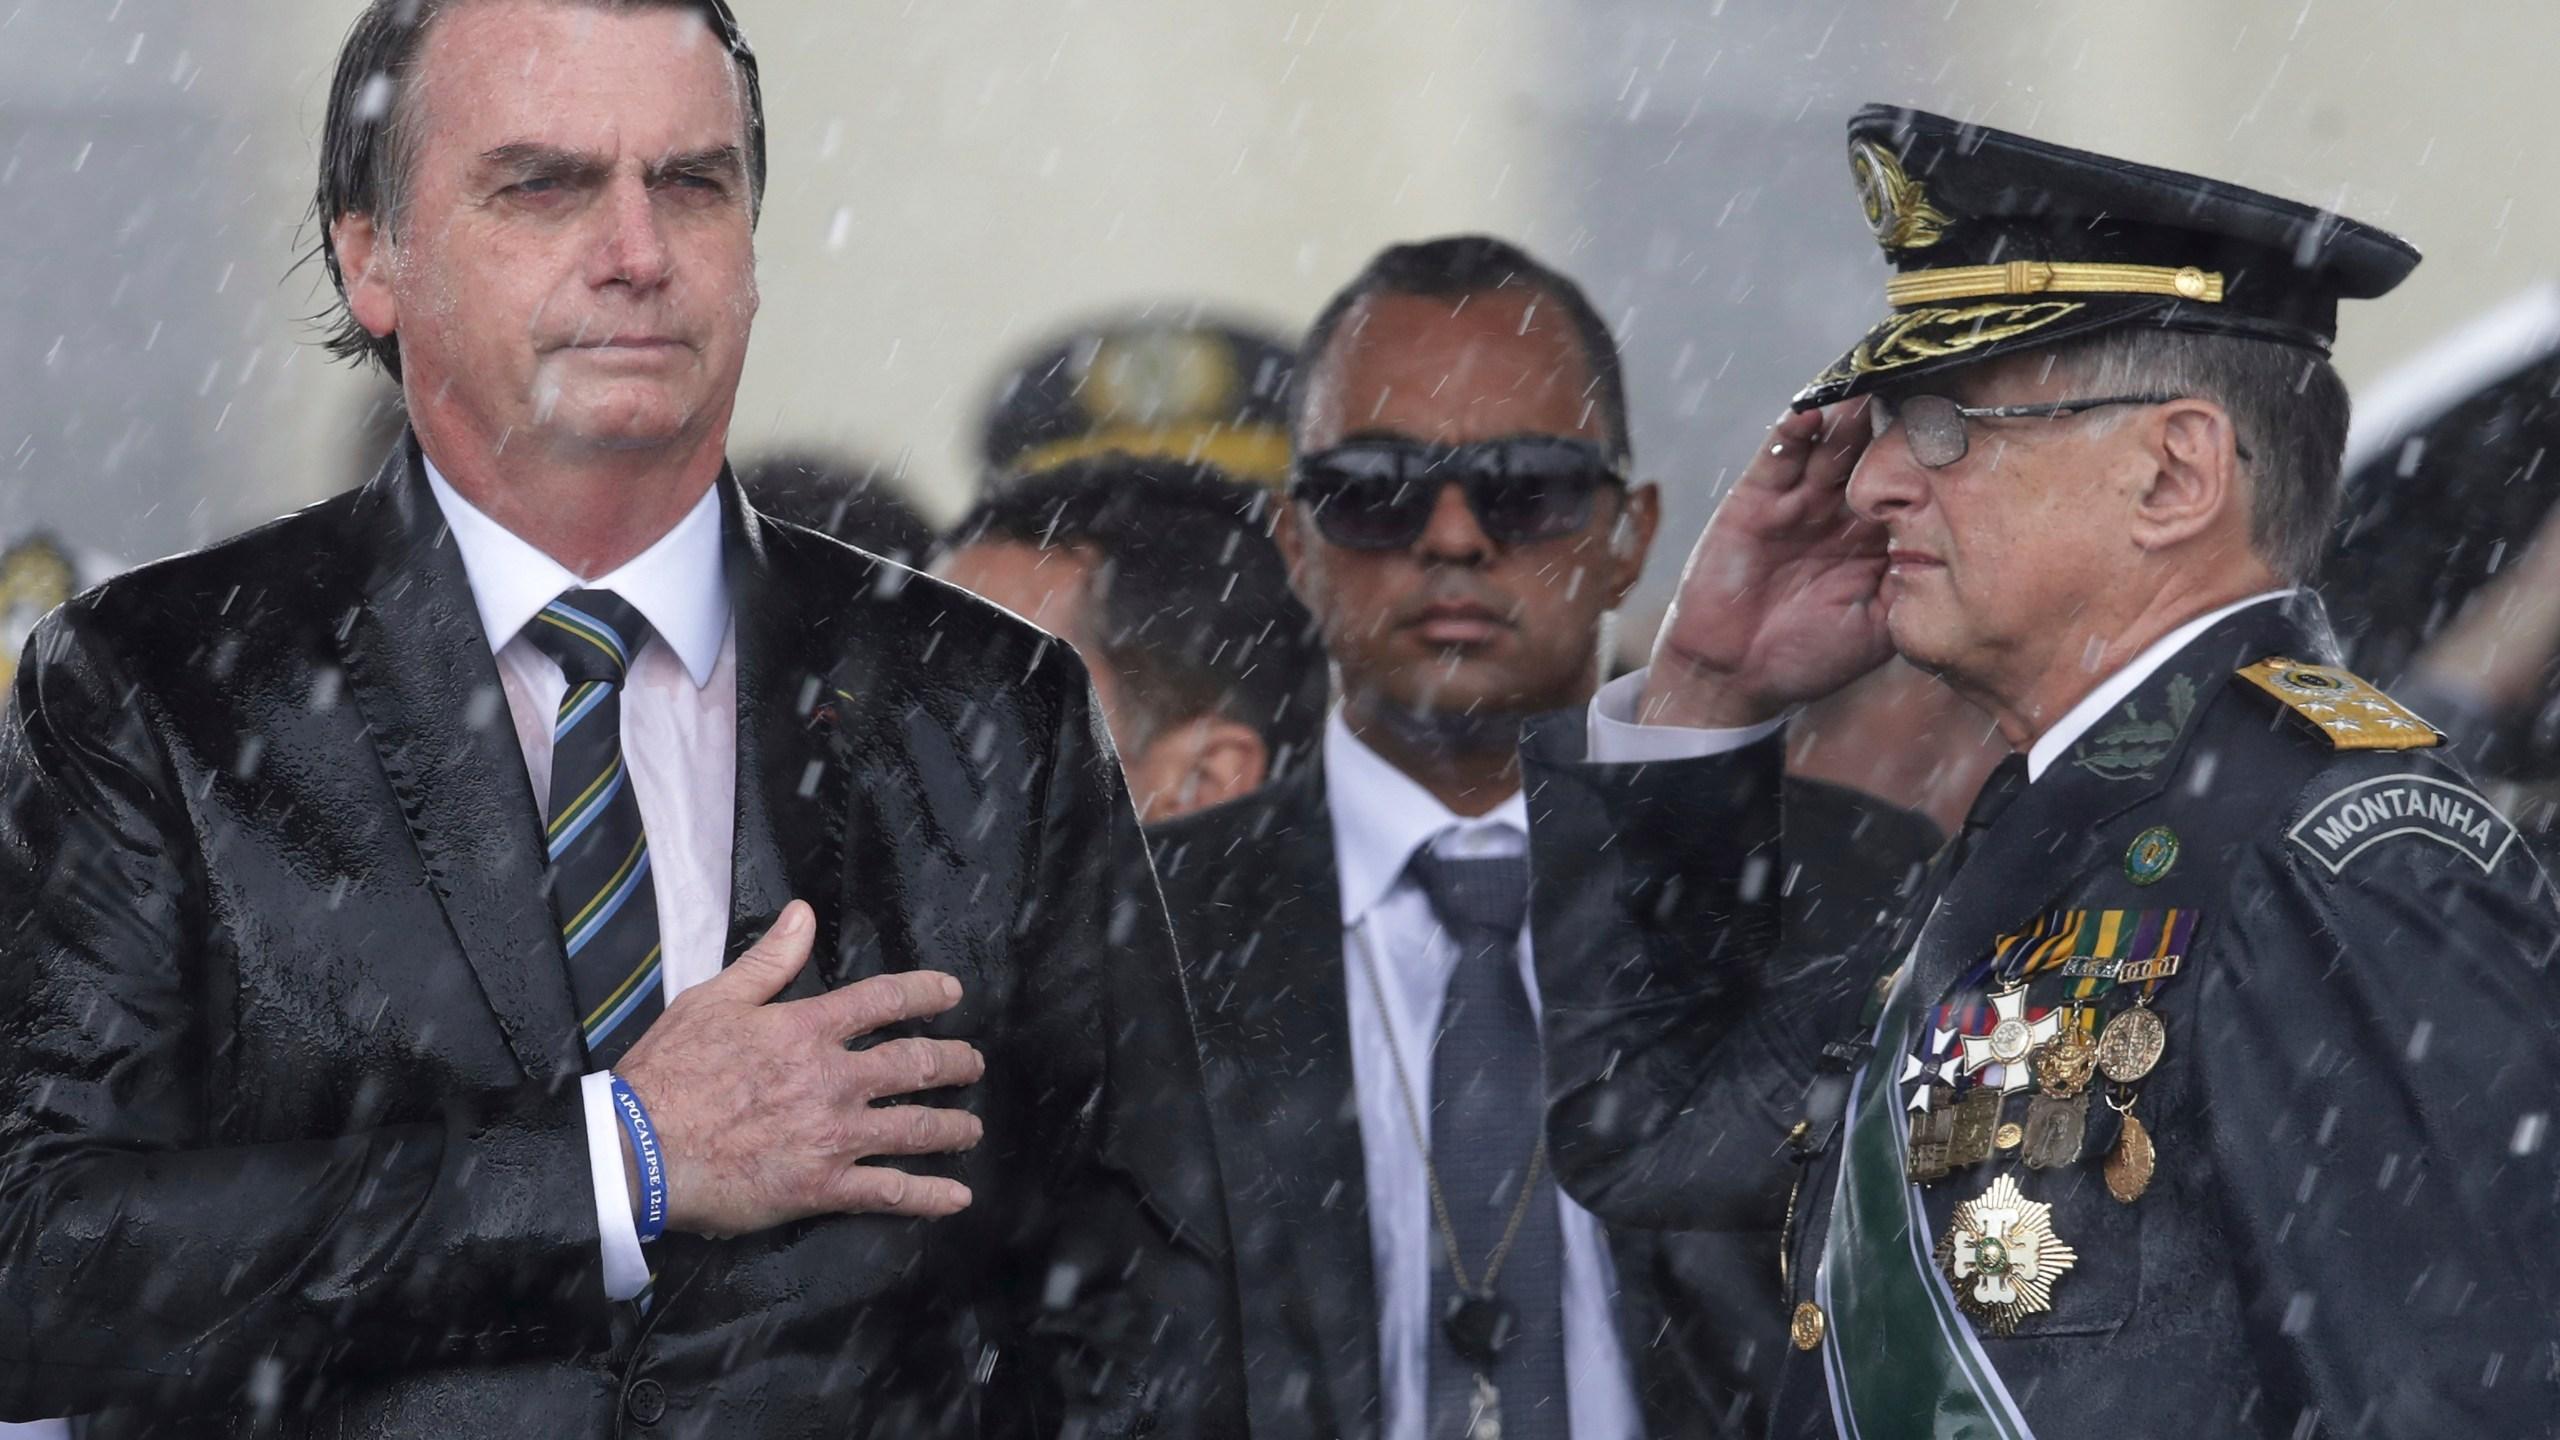 Jair Bolsonaro, Edson Leal Pujol